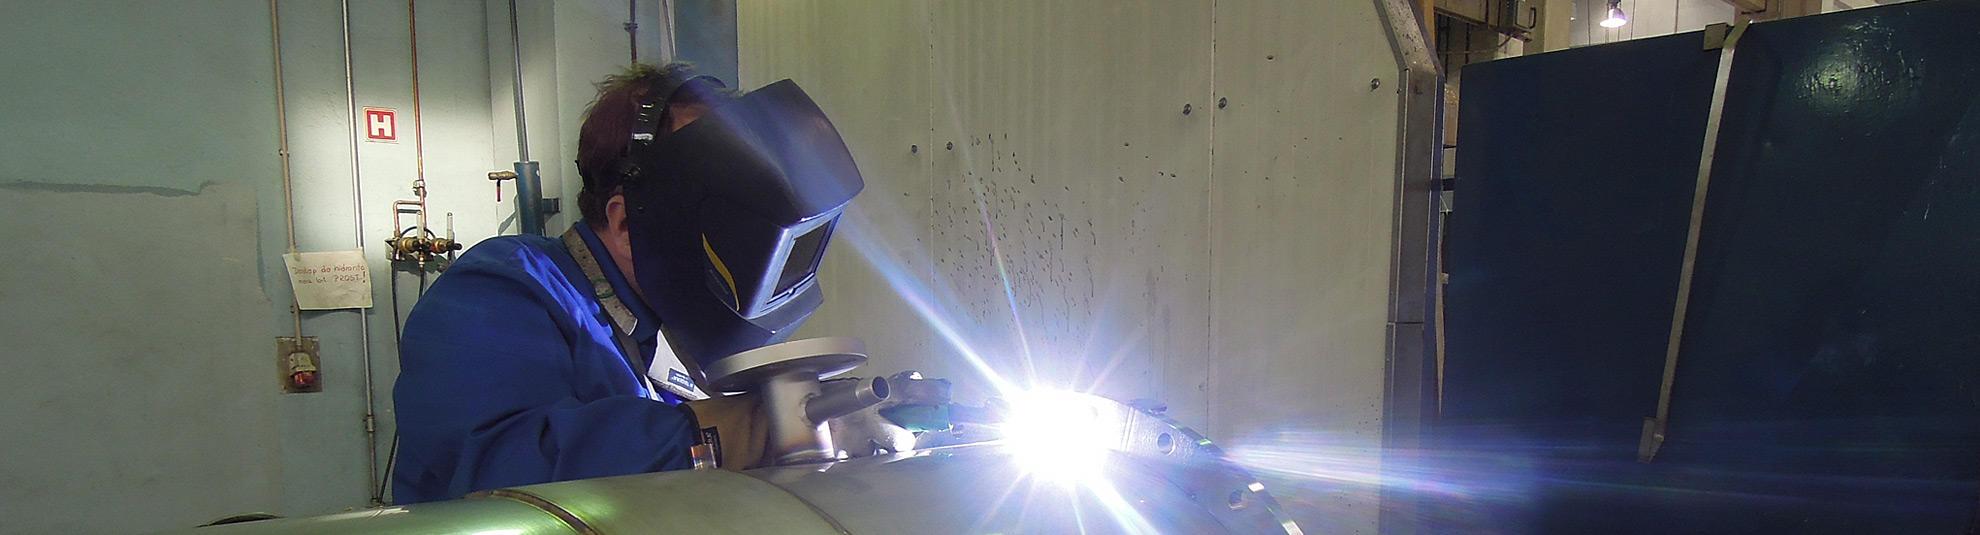 ALCHROM Thies Proizvodnja procesne opreme